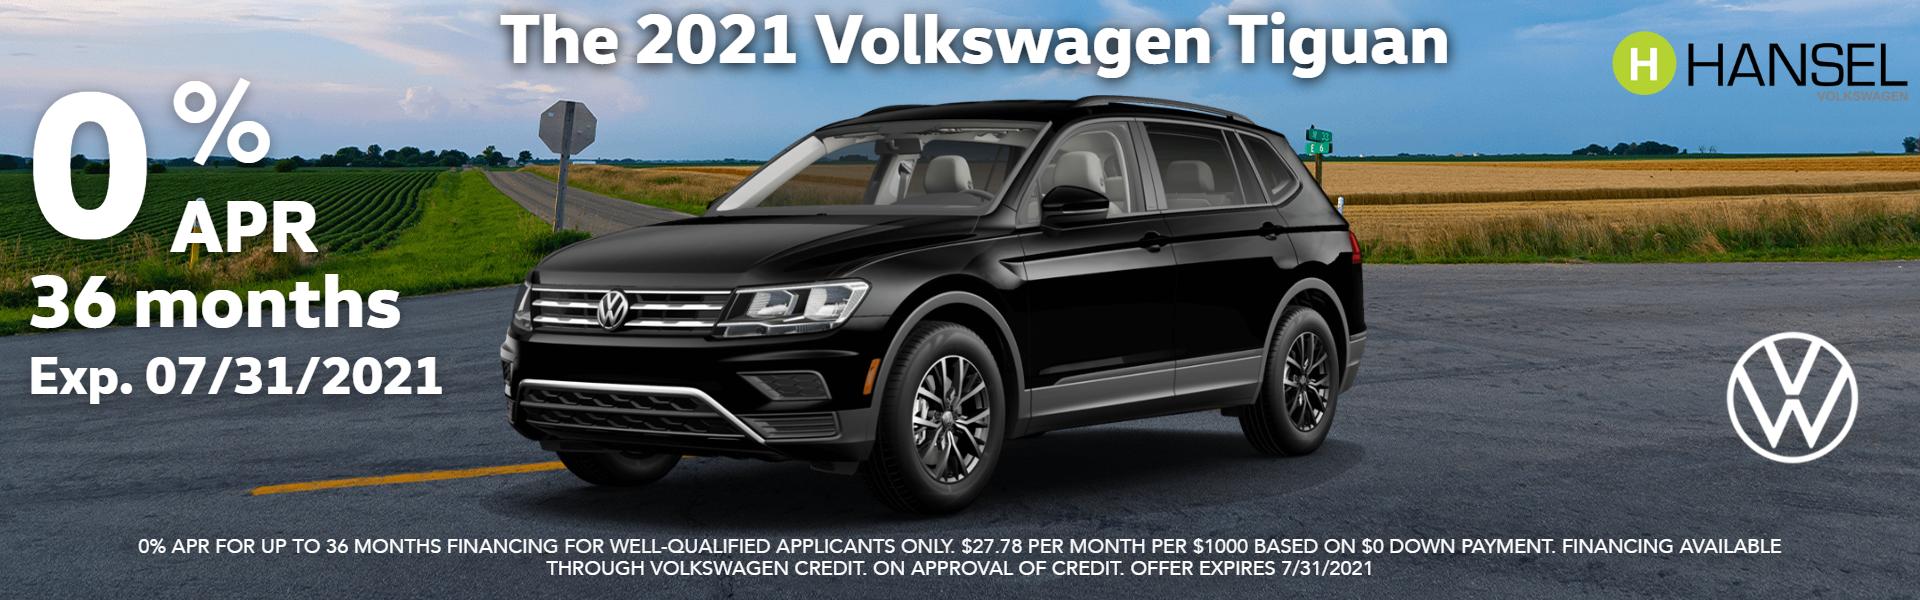 2021_Volkswagen_Tiguan_S_Fri Jul 09 2021 13_25_44 GMT-0700 (Pacific Daylight Time)